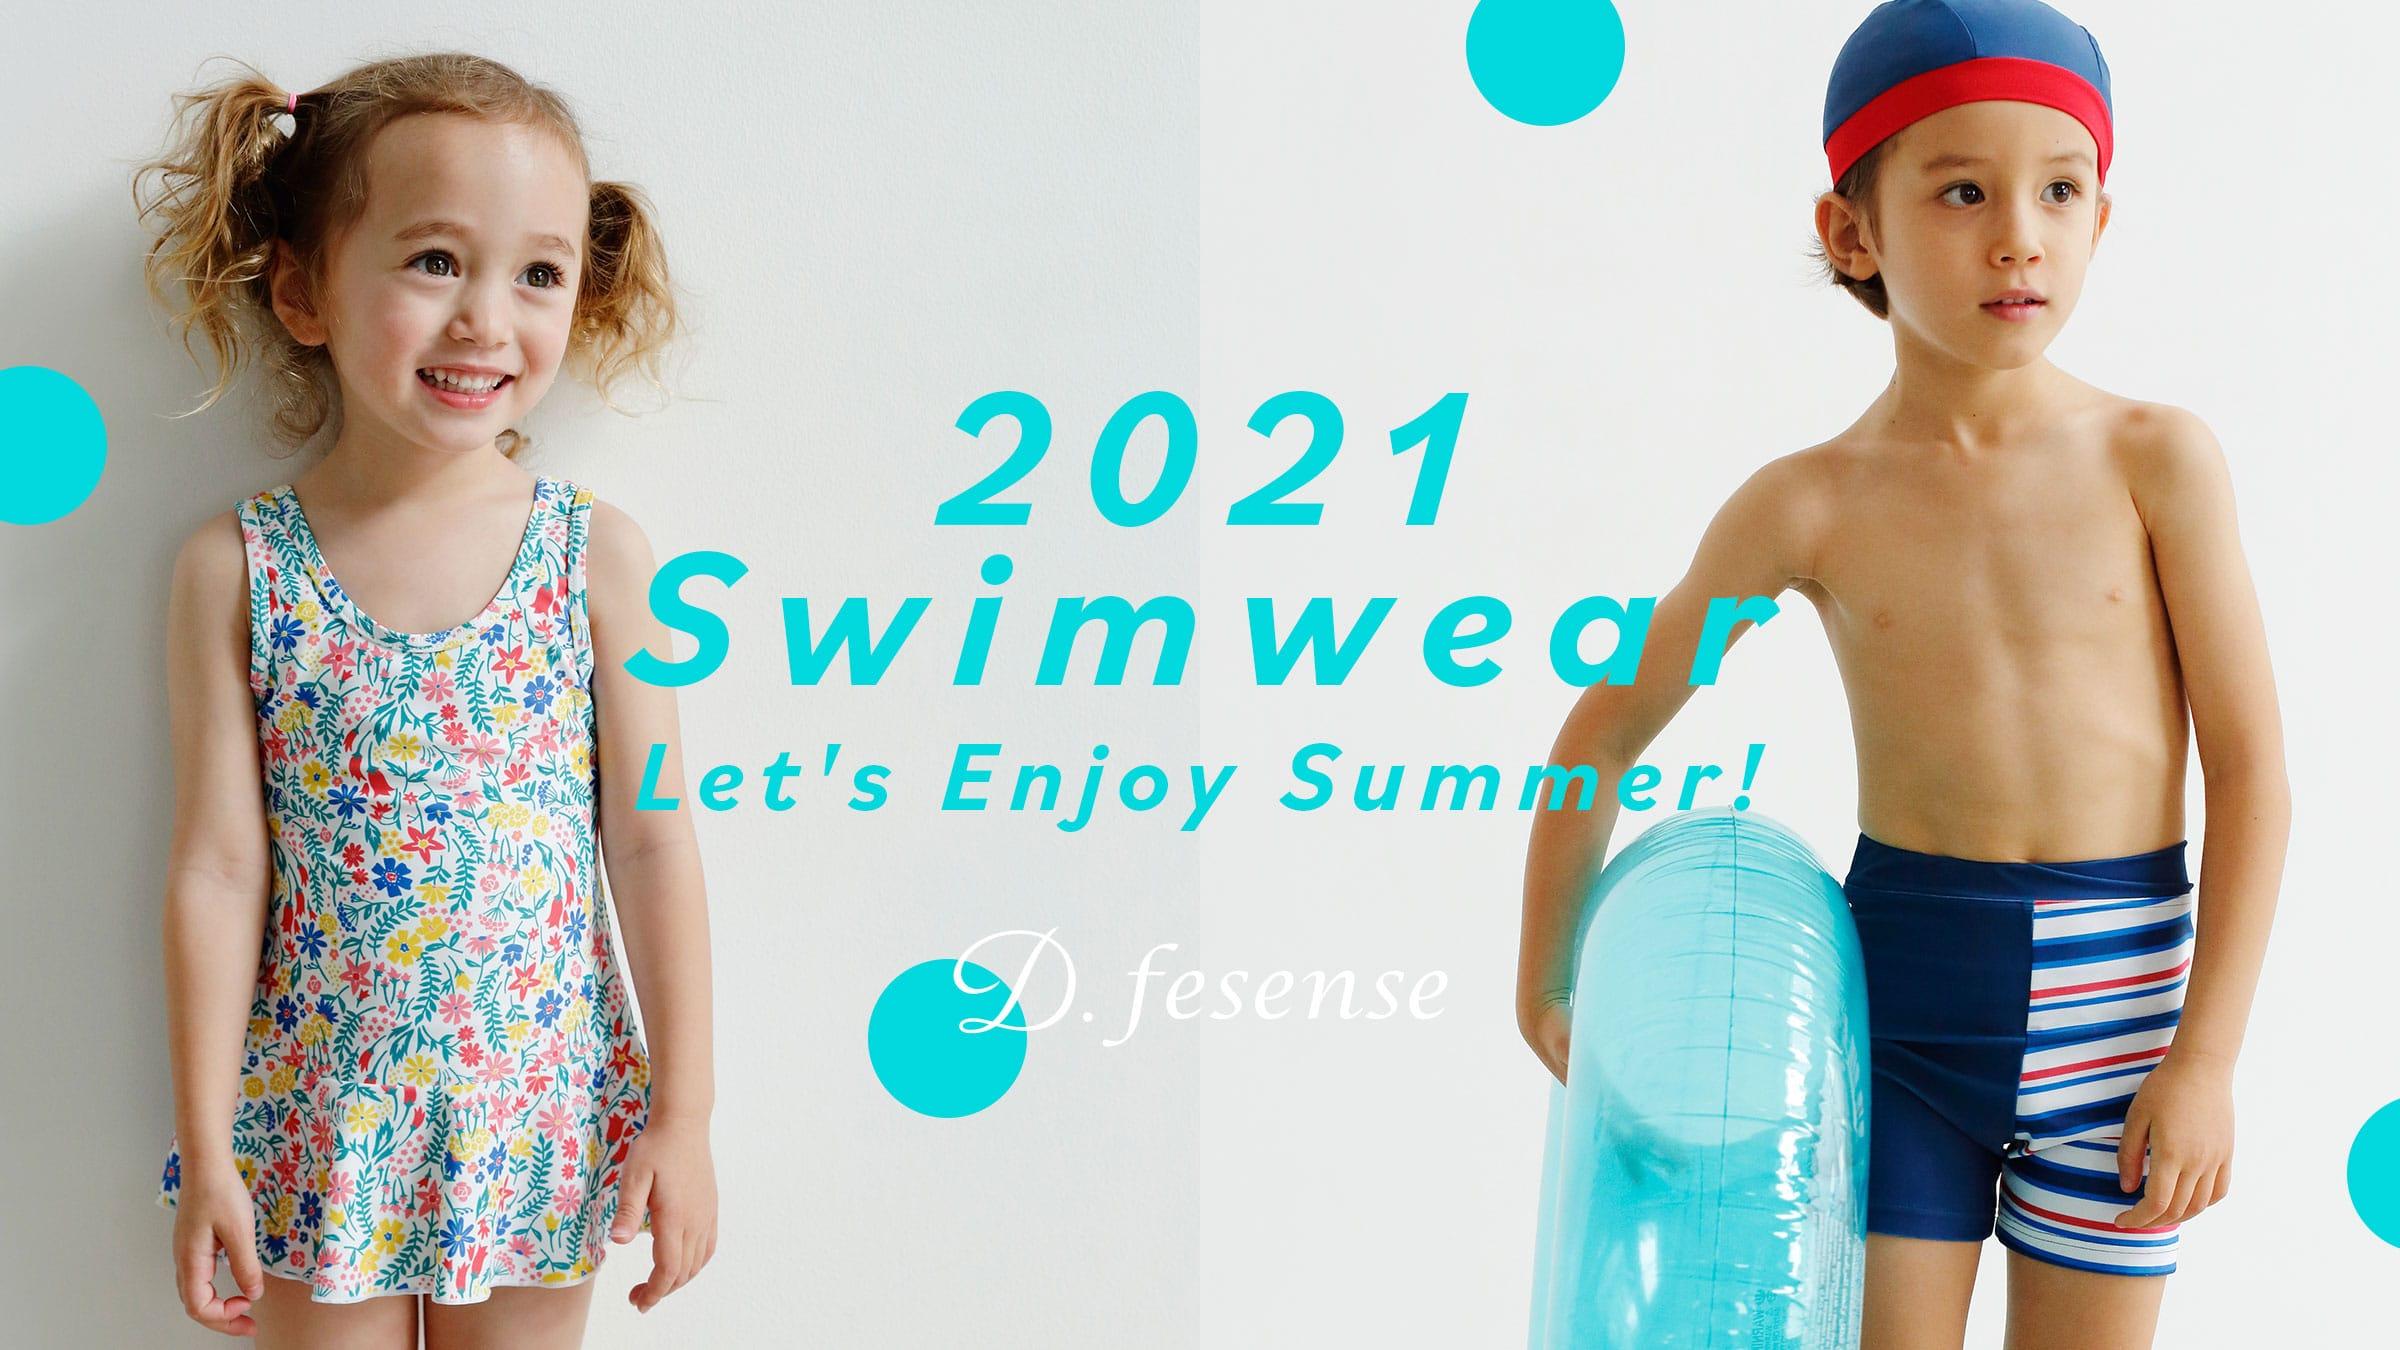 D.fesense 2021 Swimwear Let's Enjoy Summer!